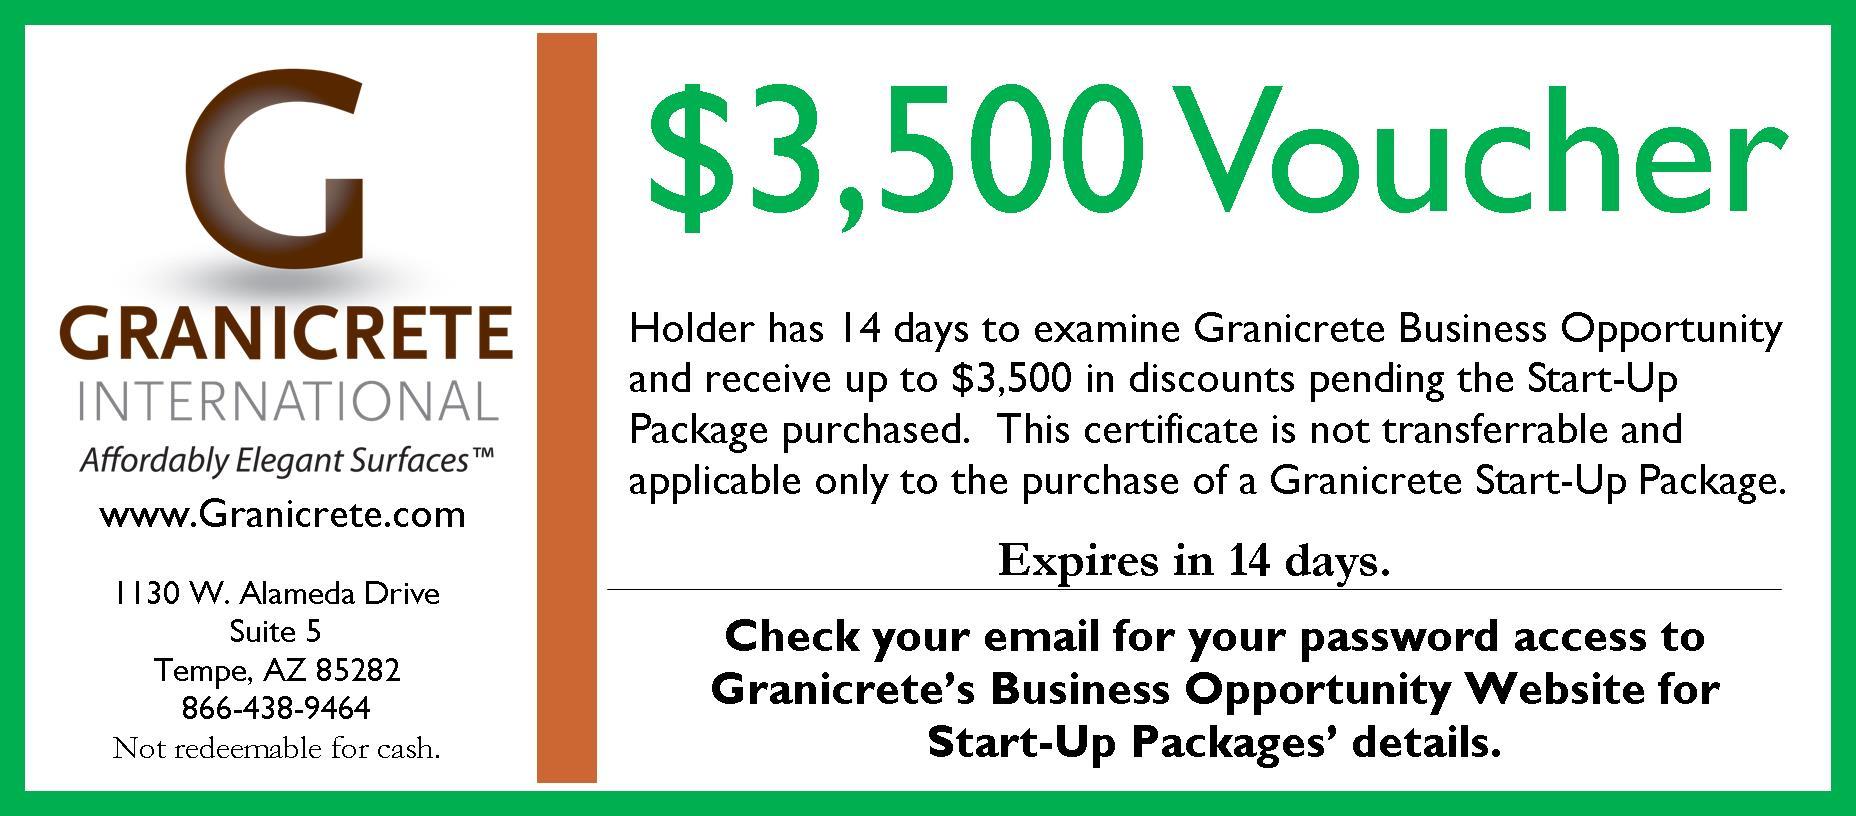 $3,500 Start-Up Voucher